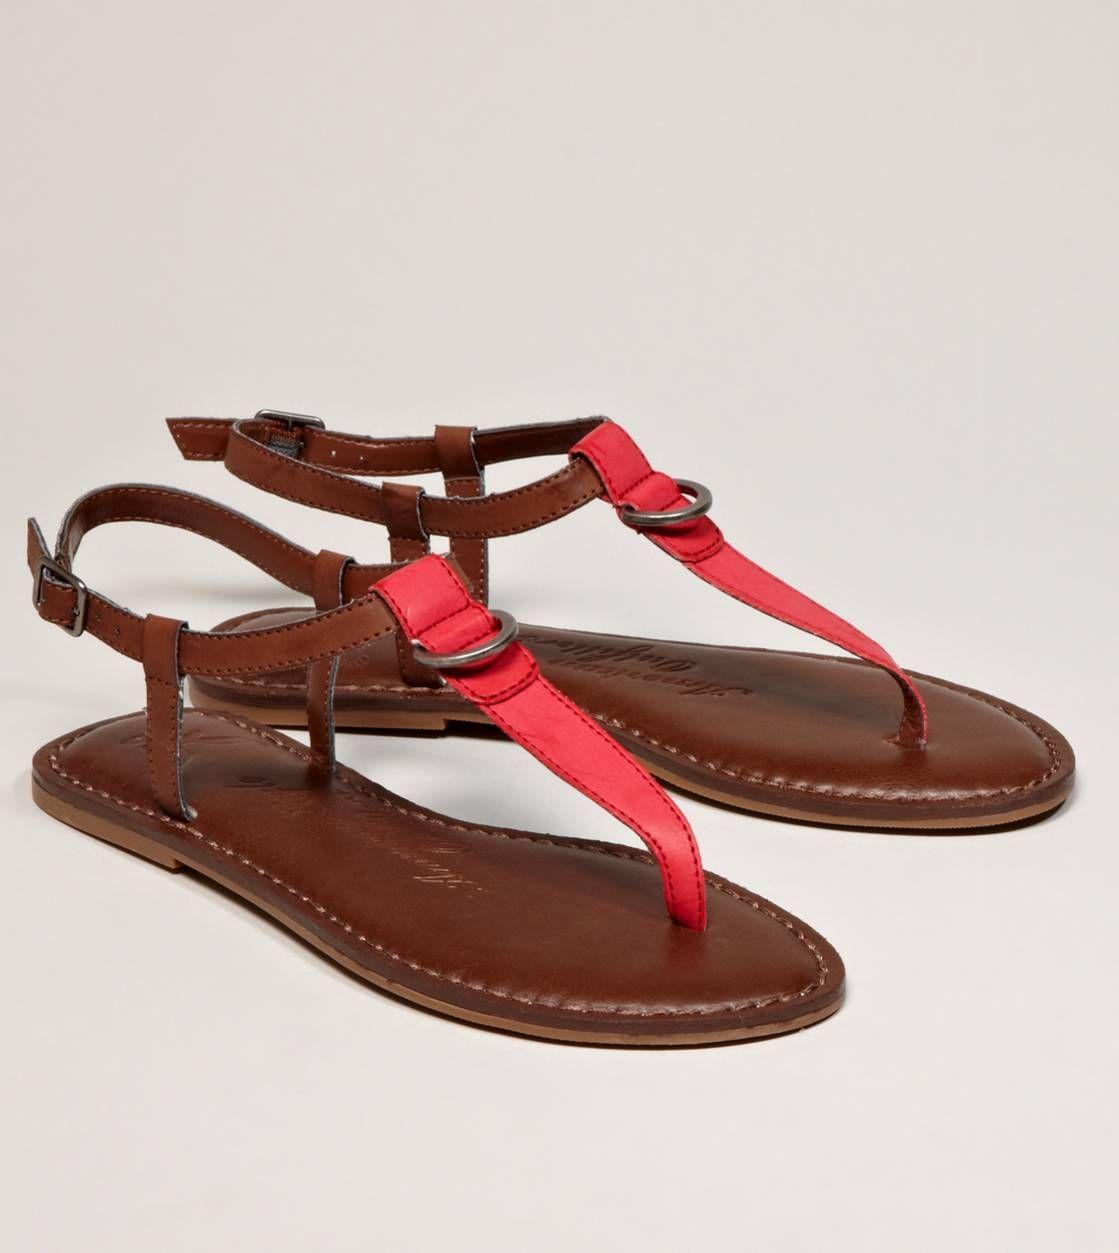 Cheery Summer sandals.